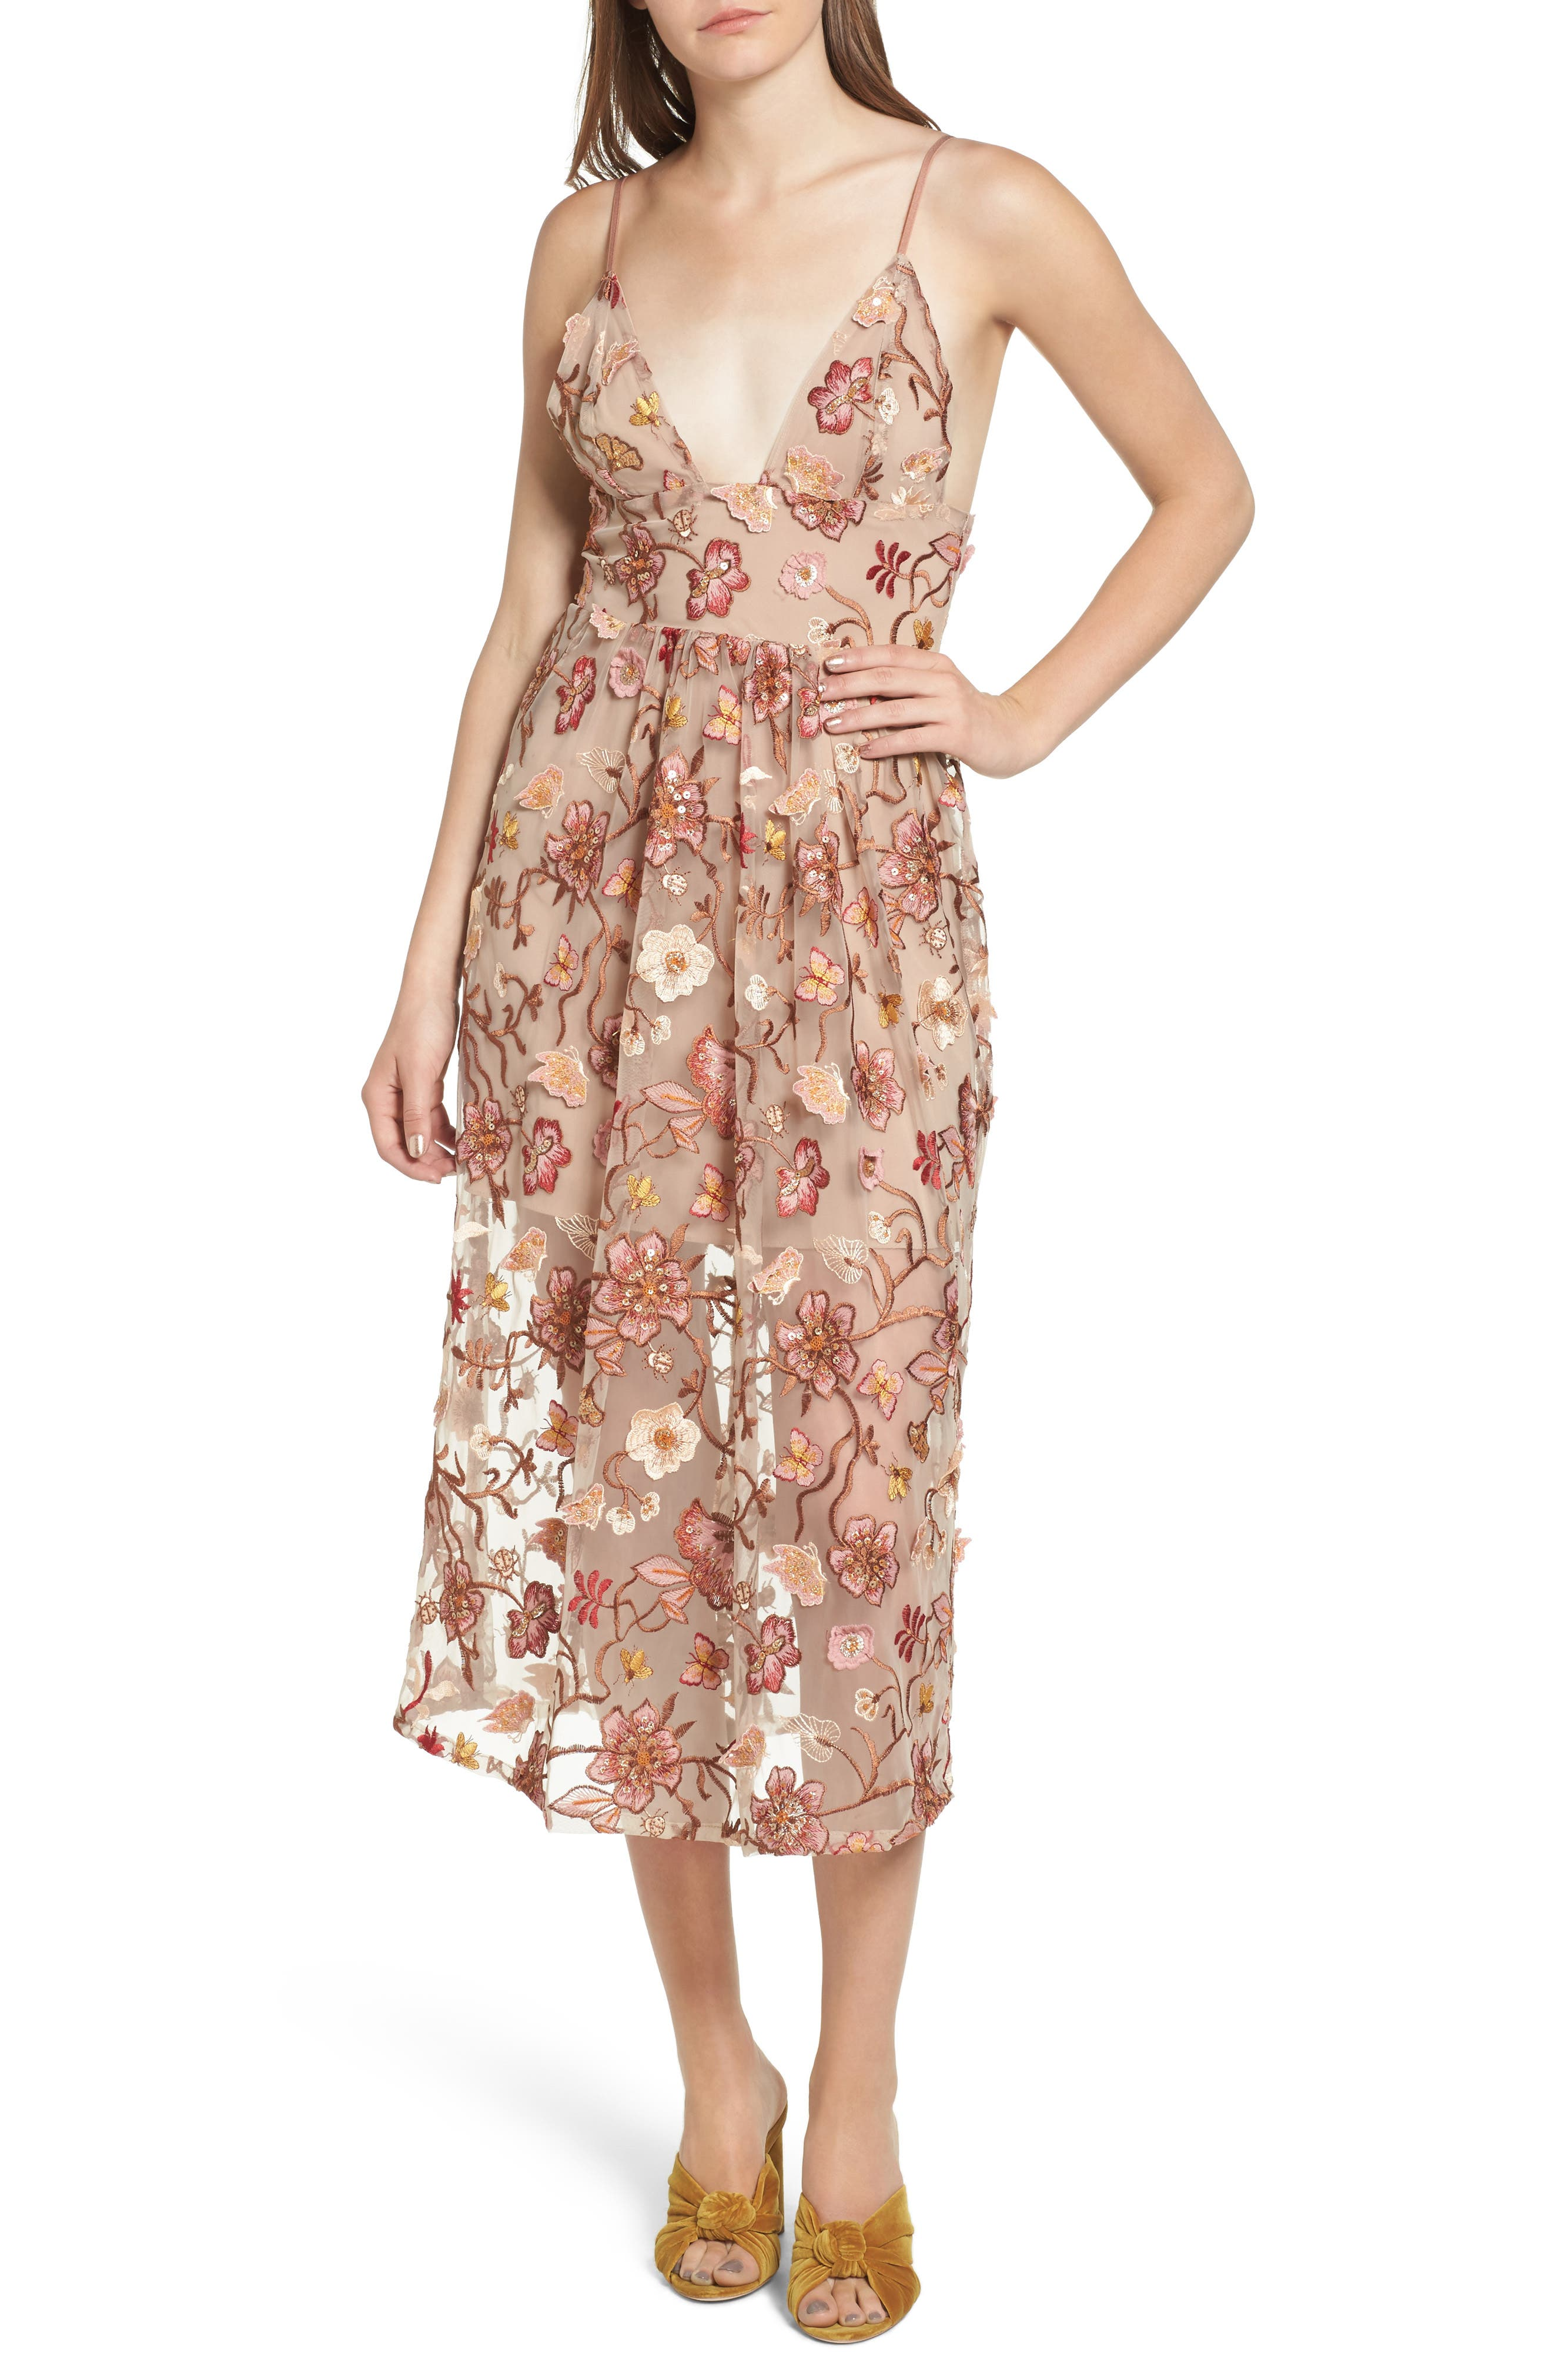 Botanic Midi Dress,                         Main,                         color, Nude Floral